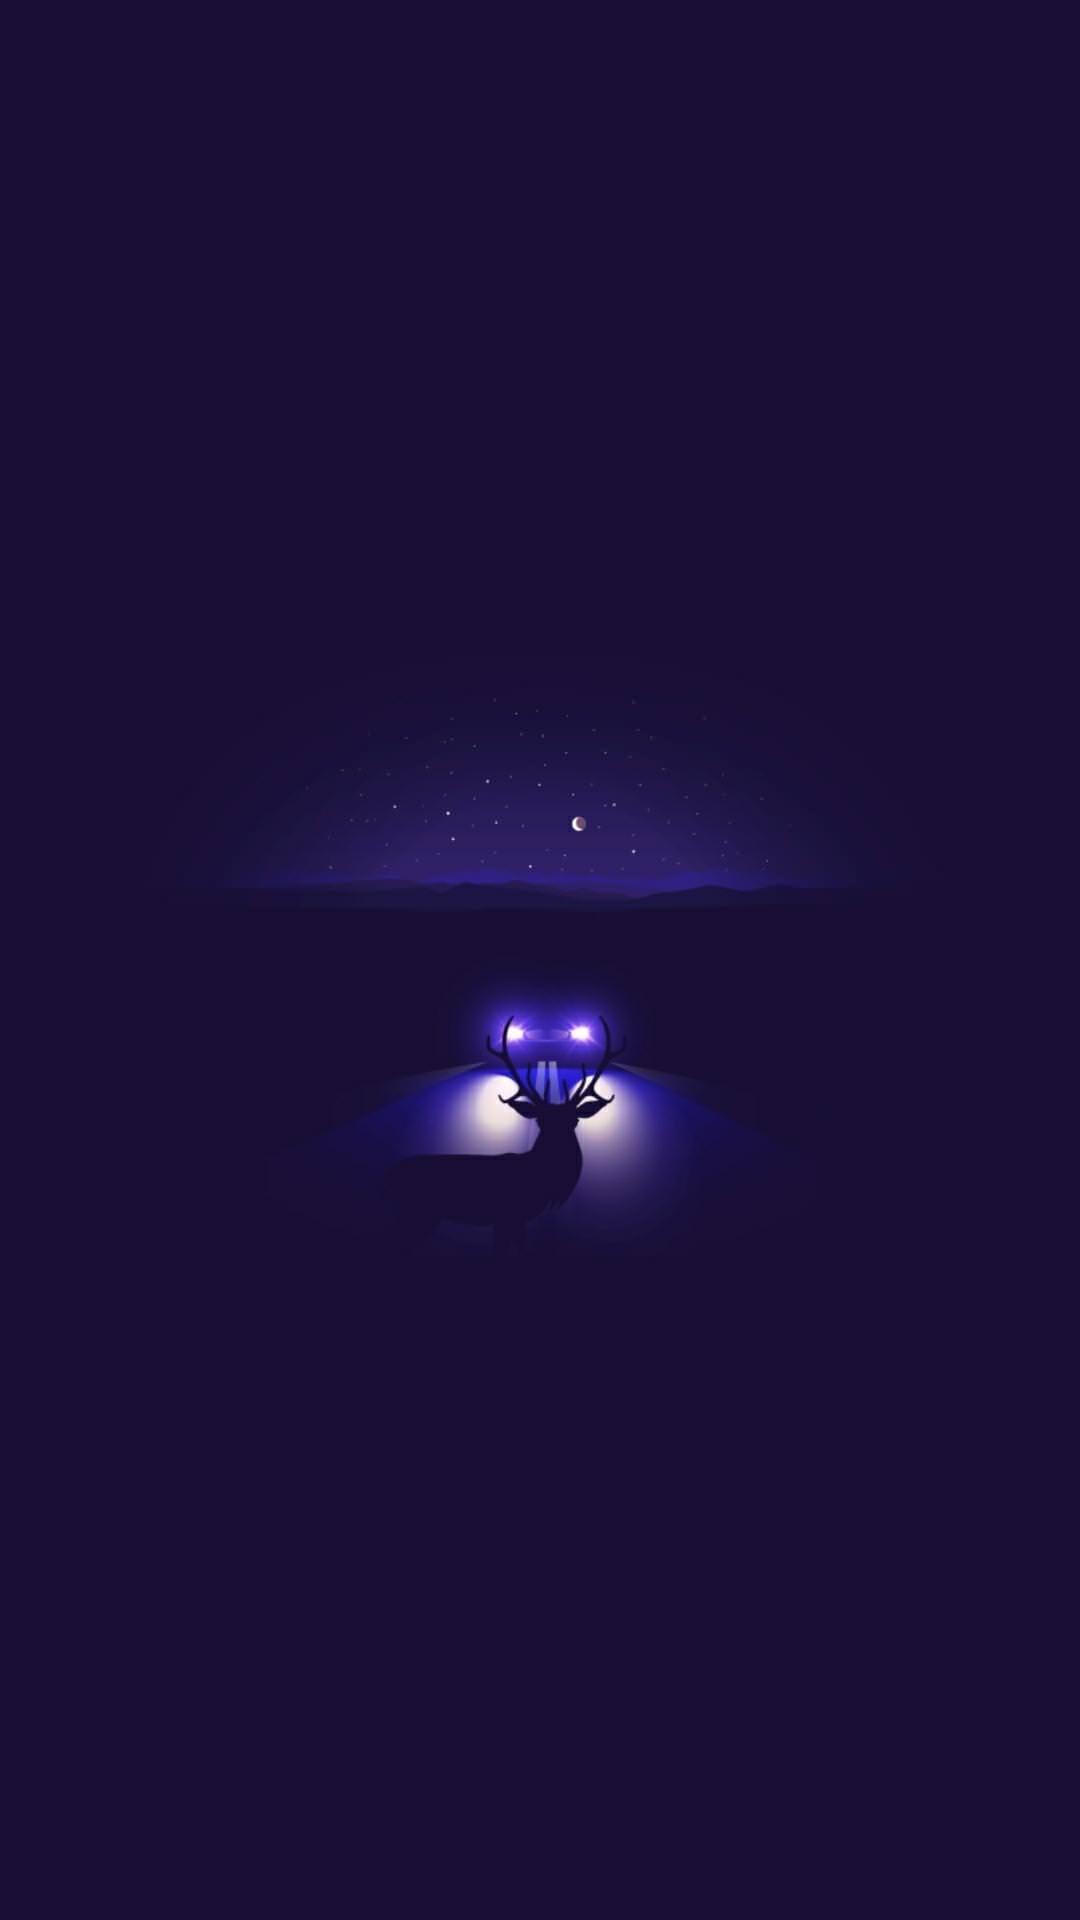 Night Road Deer iPhone Wallpaper